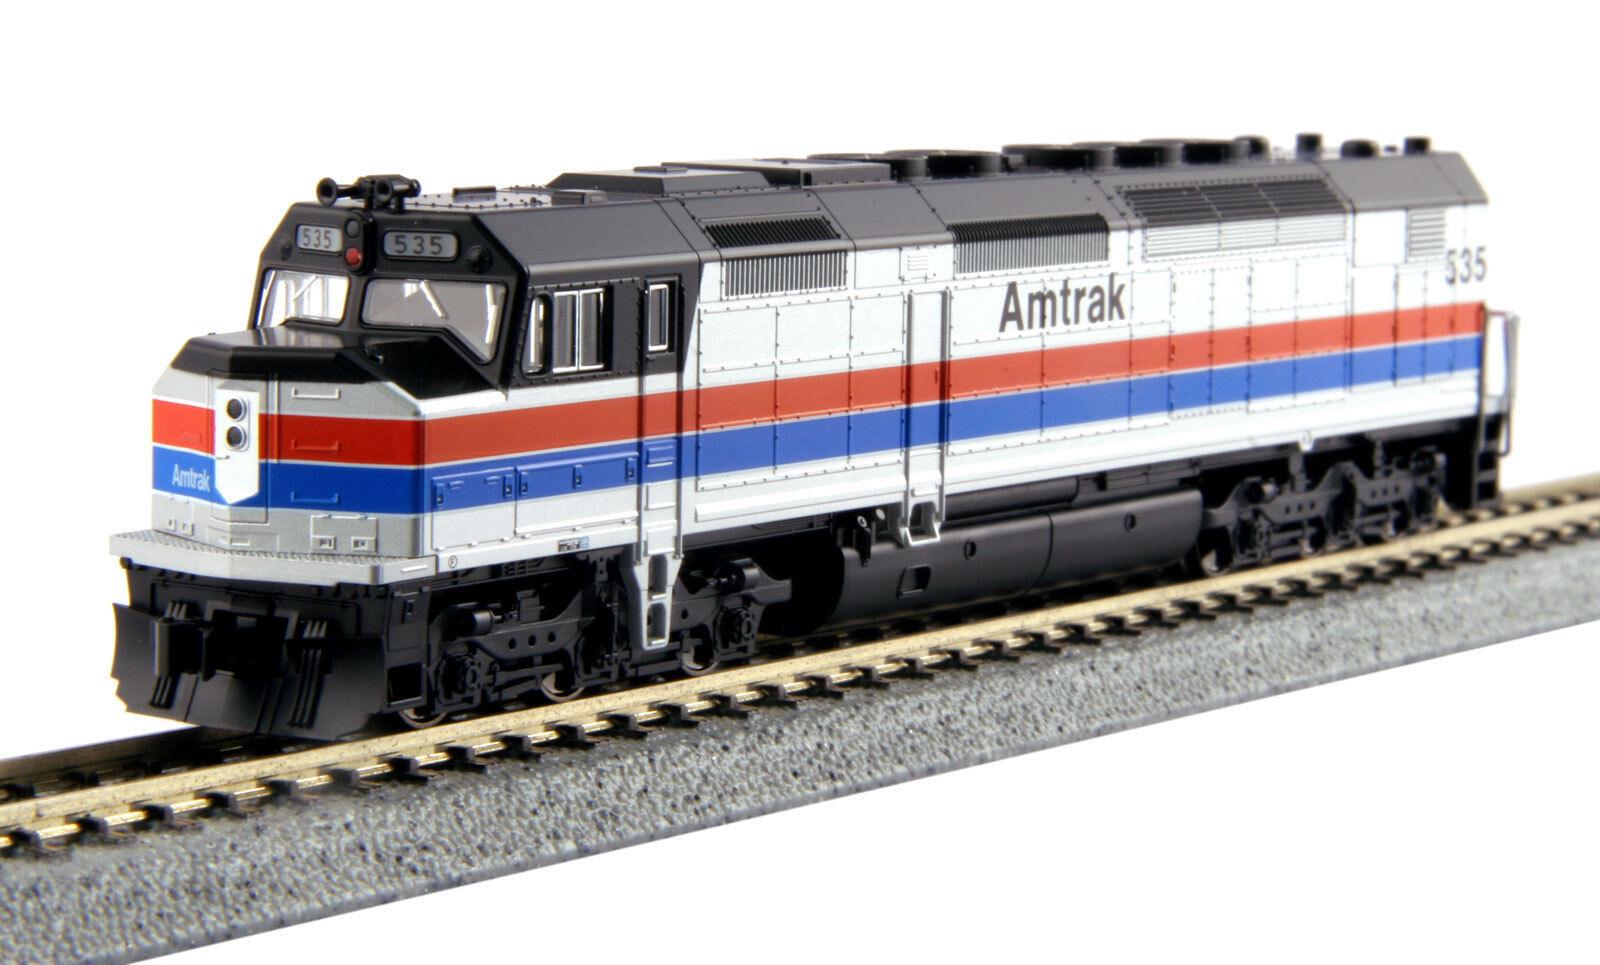 N Scale EMD EMD EMD SDP40F Locomotive (Type I Body) - Amtrak Ph II  535 - KATO  176-9204 a93ffb